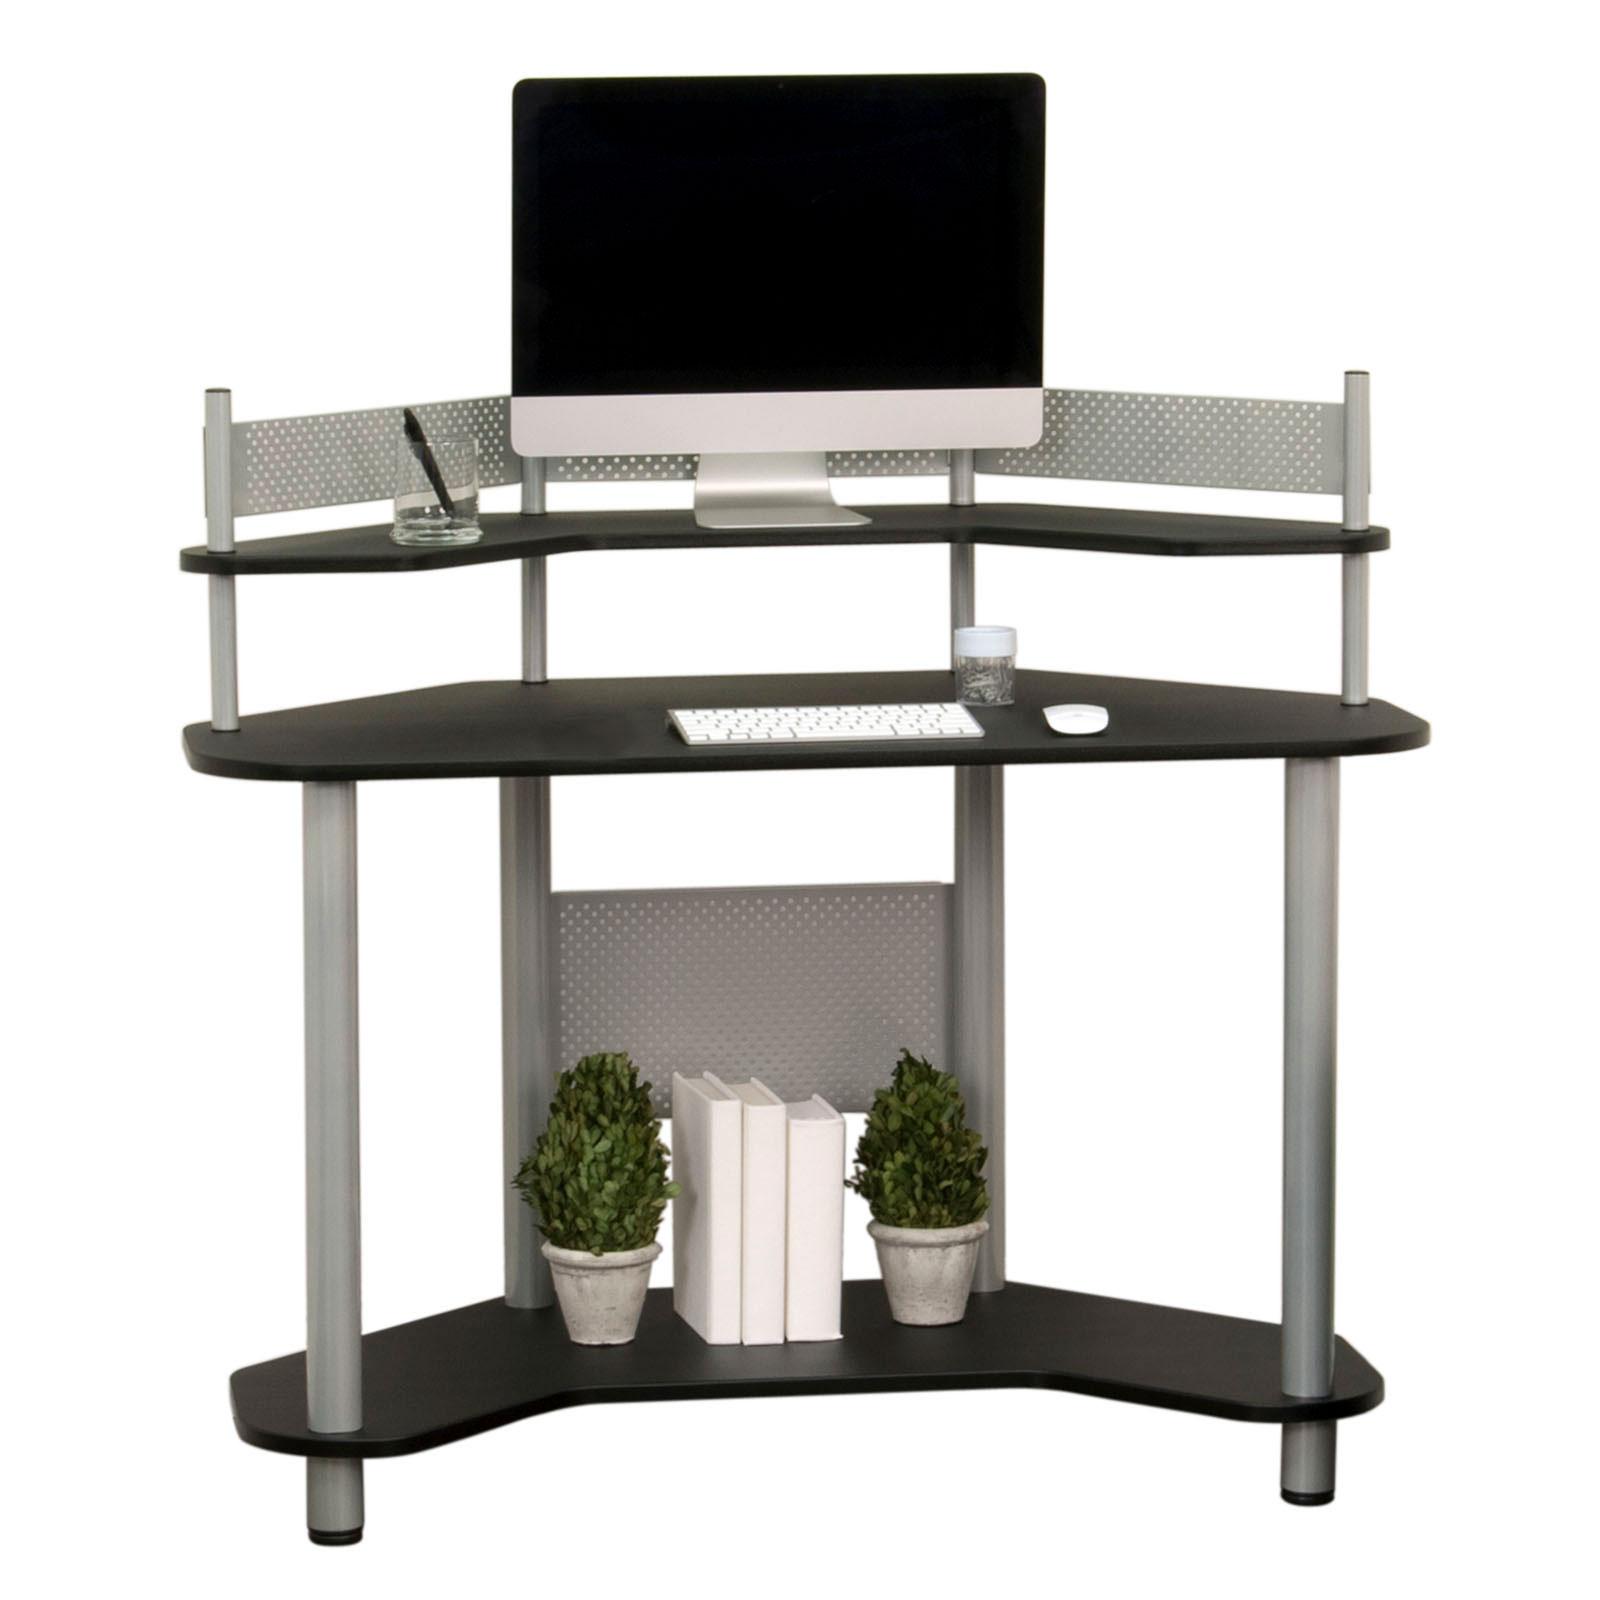 Studio Designs Calico Computer Home Office Study Workstation Corner Desk Black